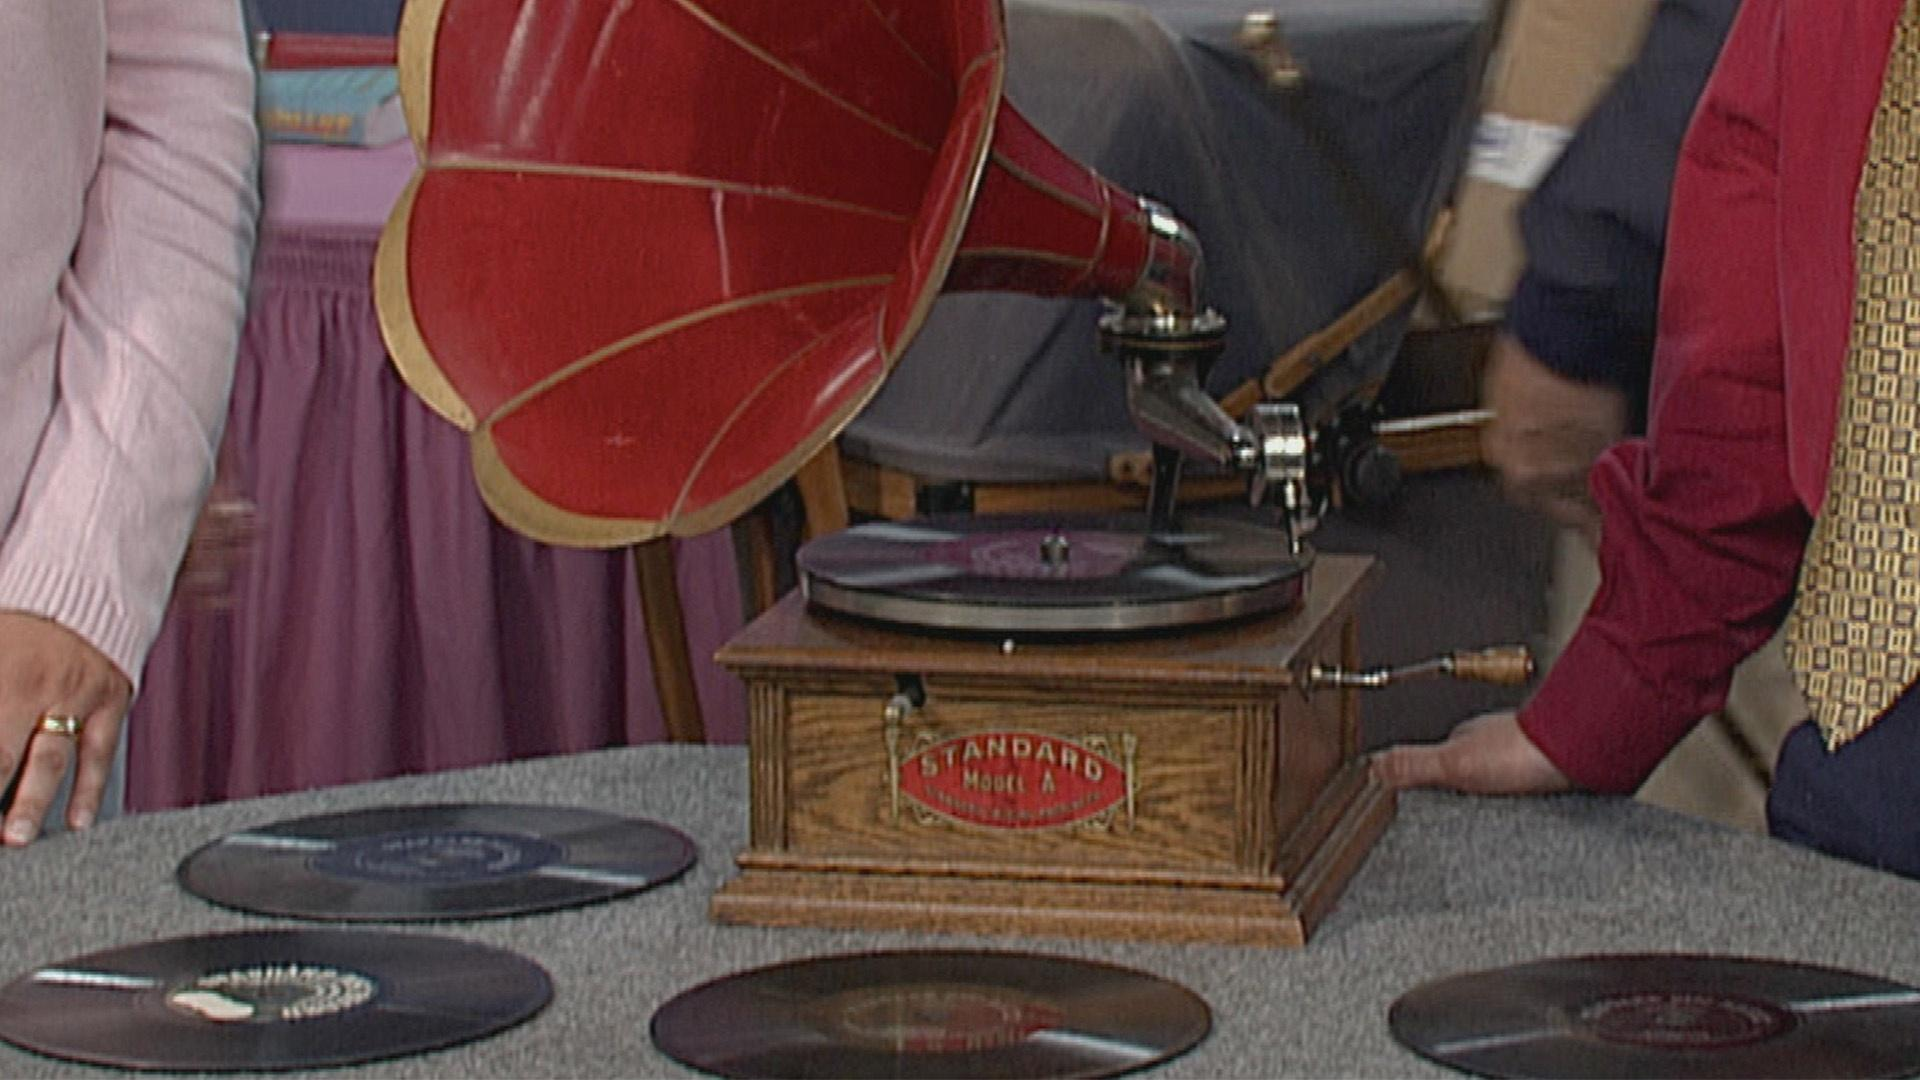 RARE Record Price Guide 78 RPM, 45 RPM, and Albums ...